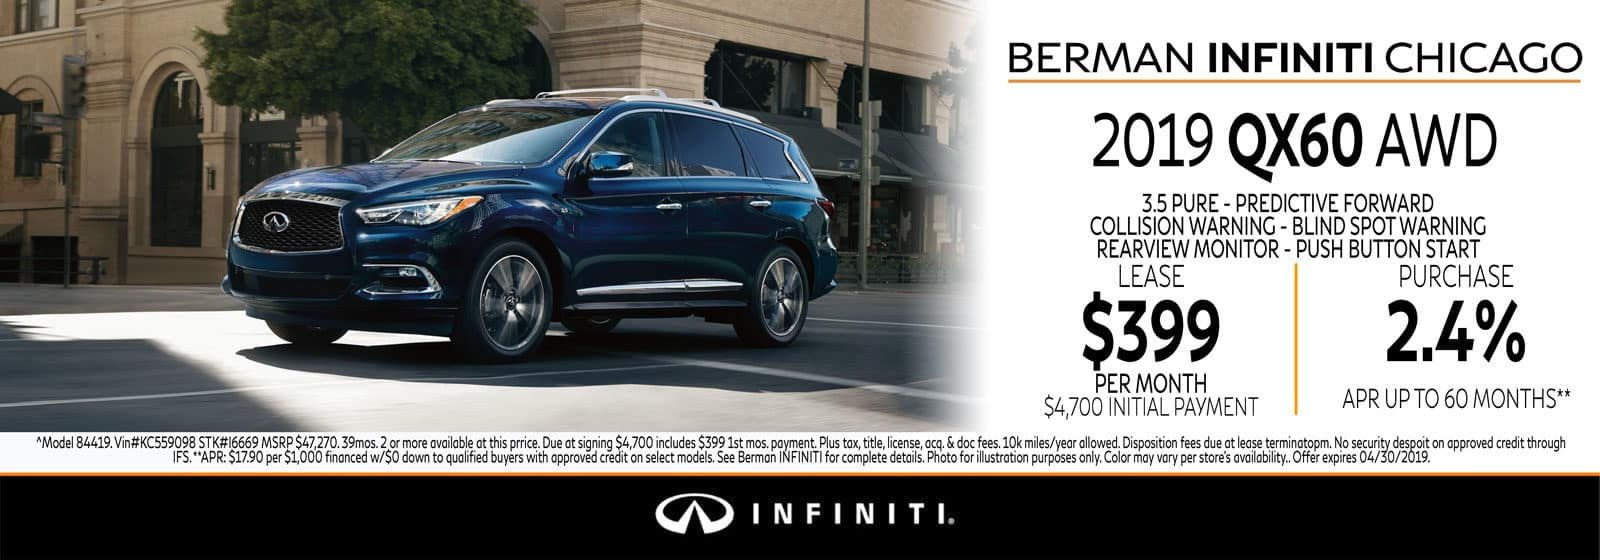 New 2019 INFINITI QX60 April offer at Berman INFINITI Chicago!